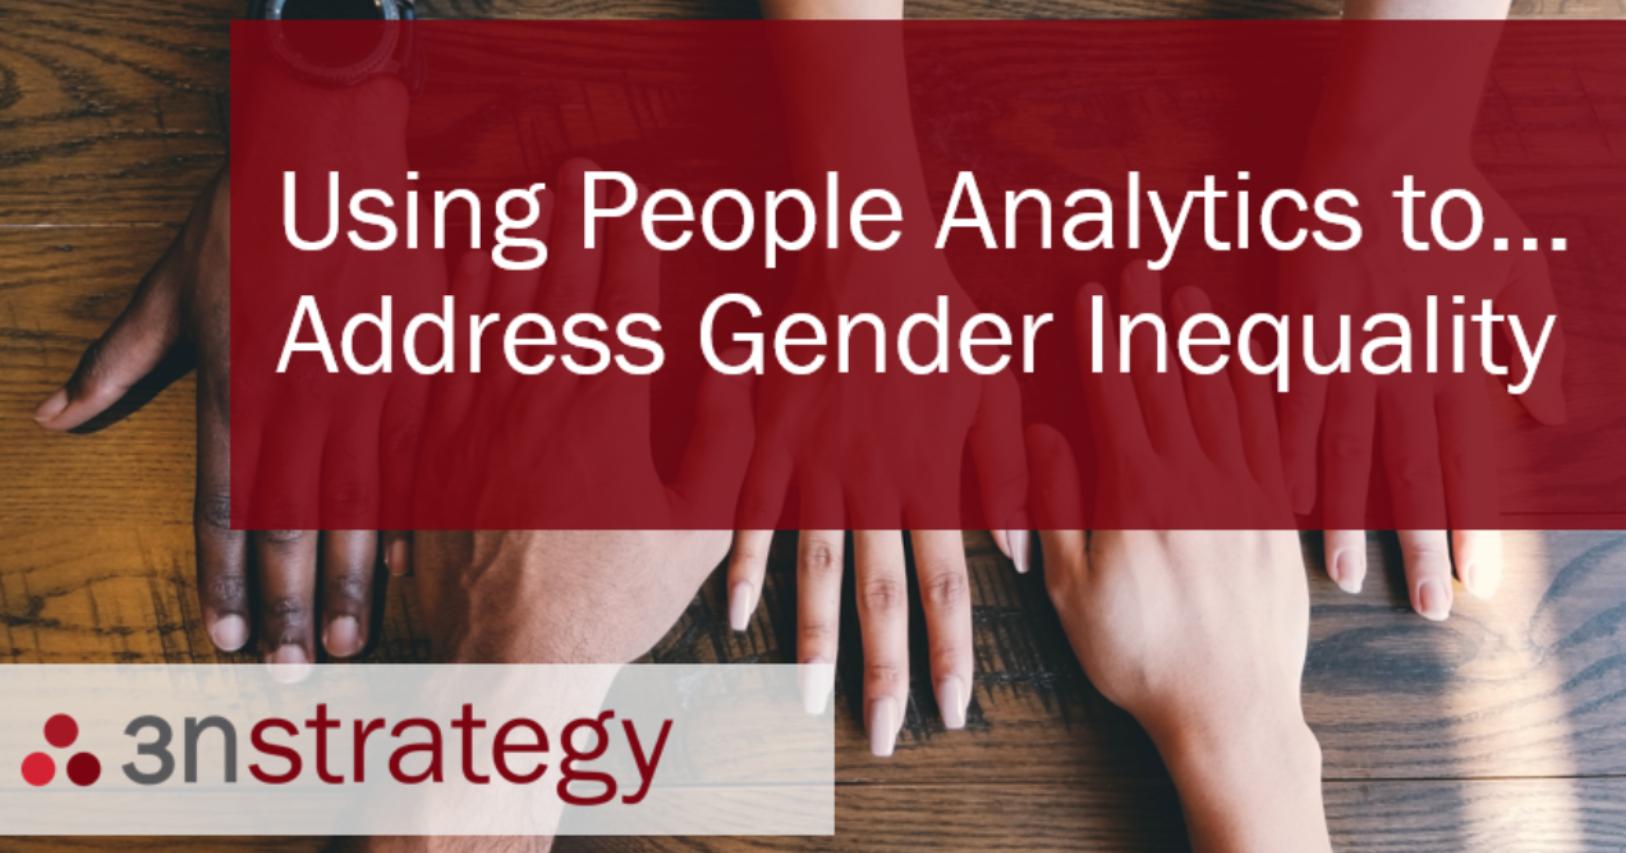 Using People Analytics to Address Gender Inequality